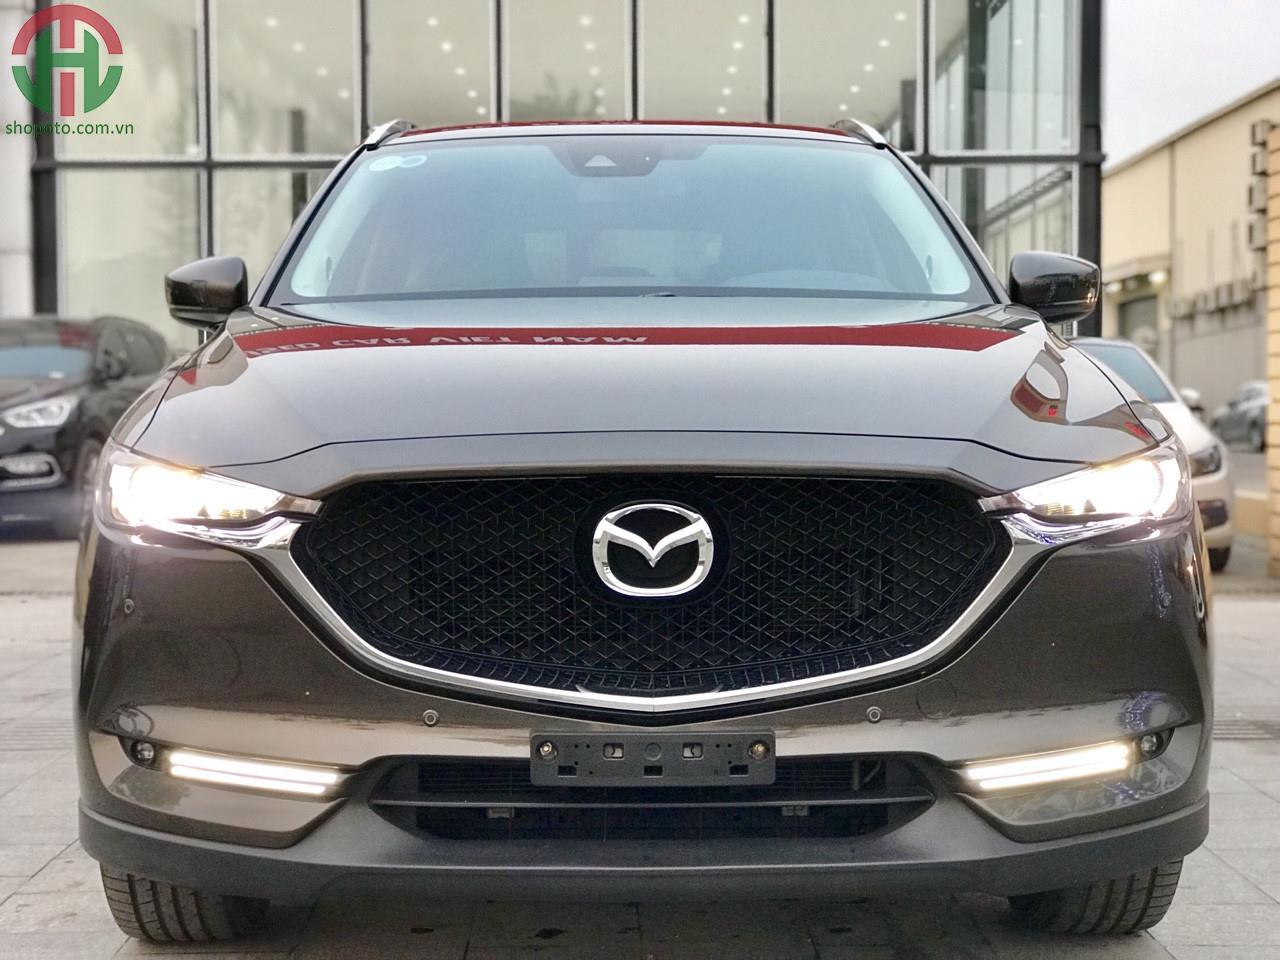 Mazda CX5 2.5 AT 2WD 1 Cầu 2018 màu Nâu